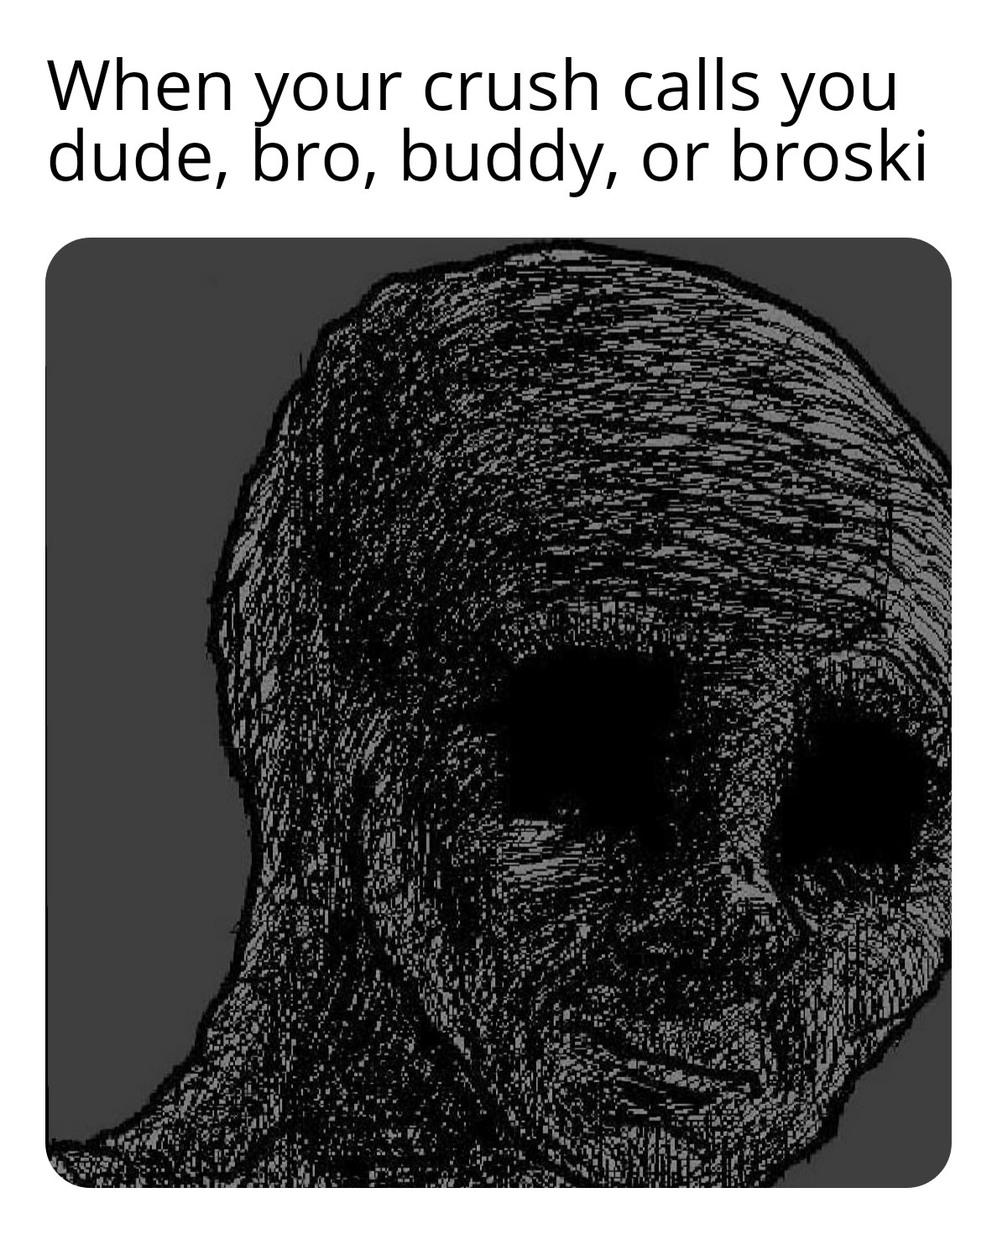 Goin through some shit right now - meme